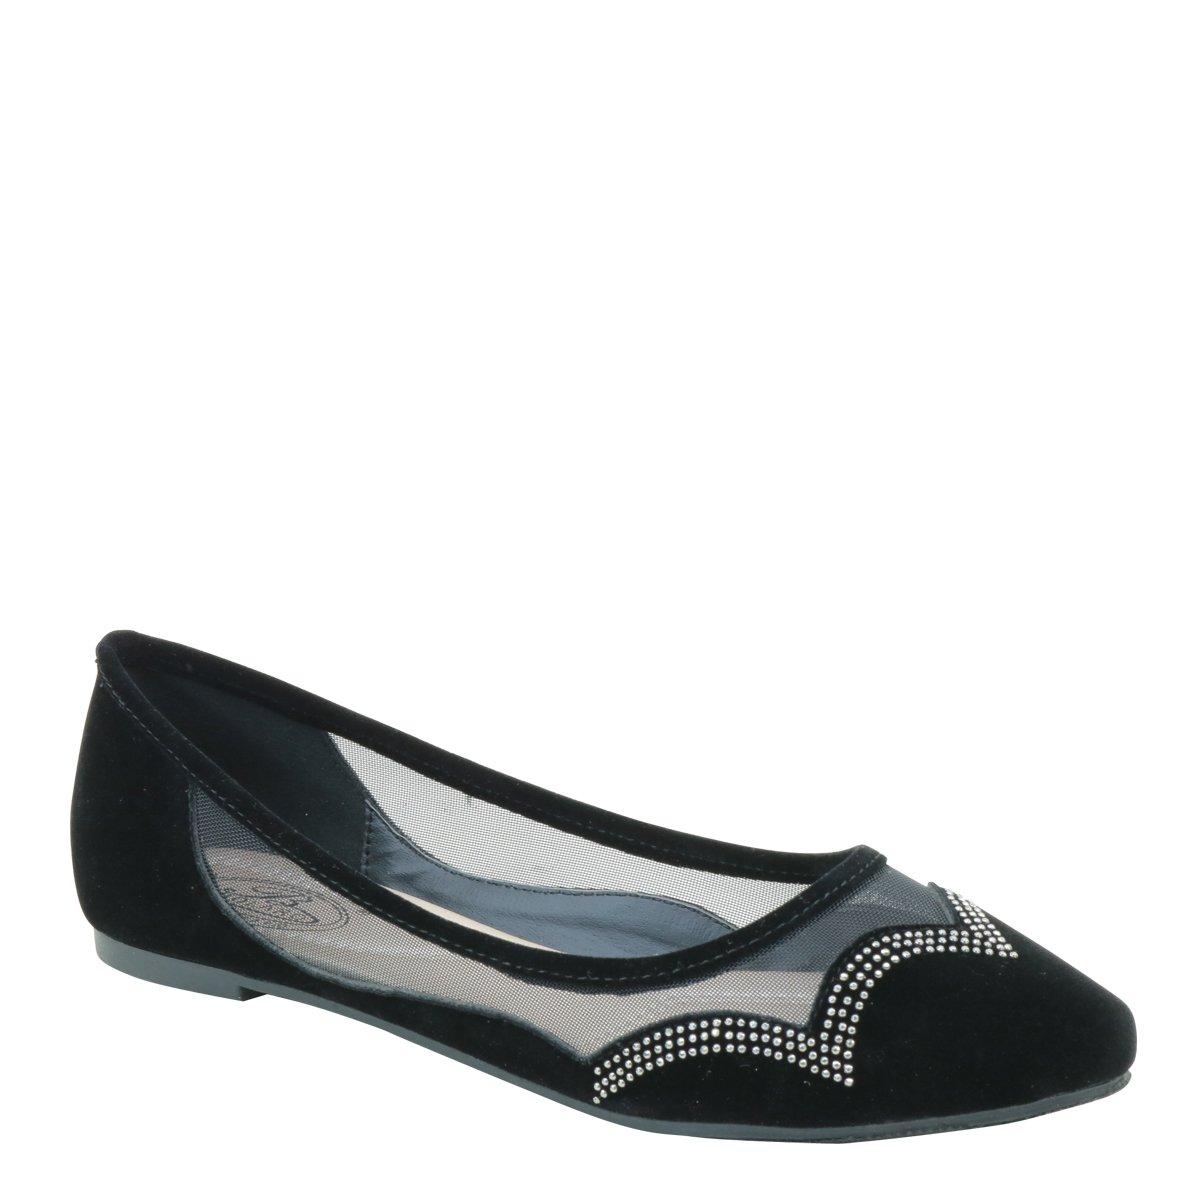 New Brieten Women's Rhinestone Mesh Pointed Toe Flats Comfortable Shoes B06XCBFJGB 6 B(M) US|Black